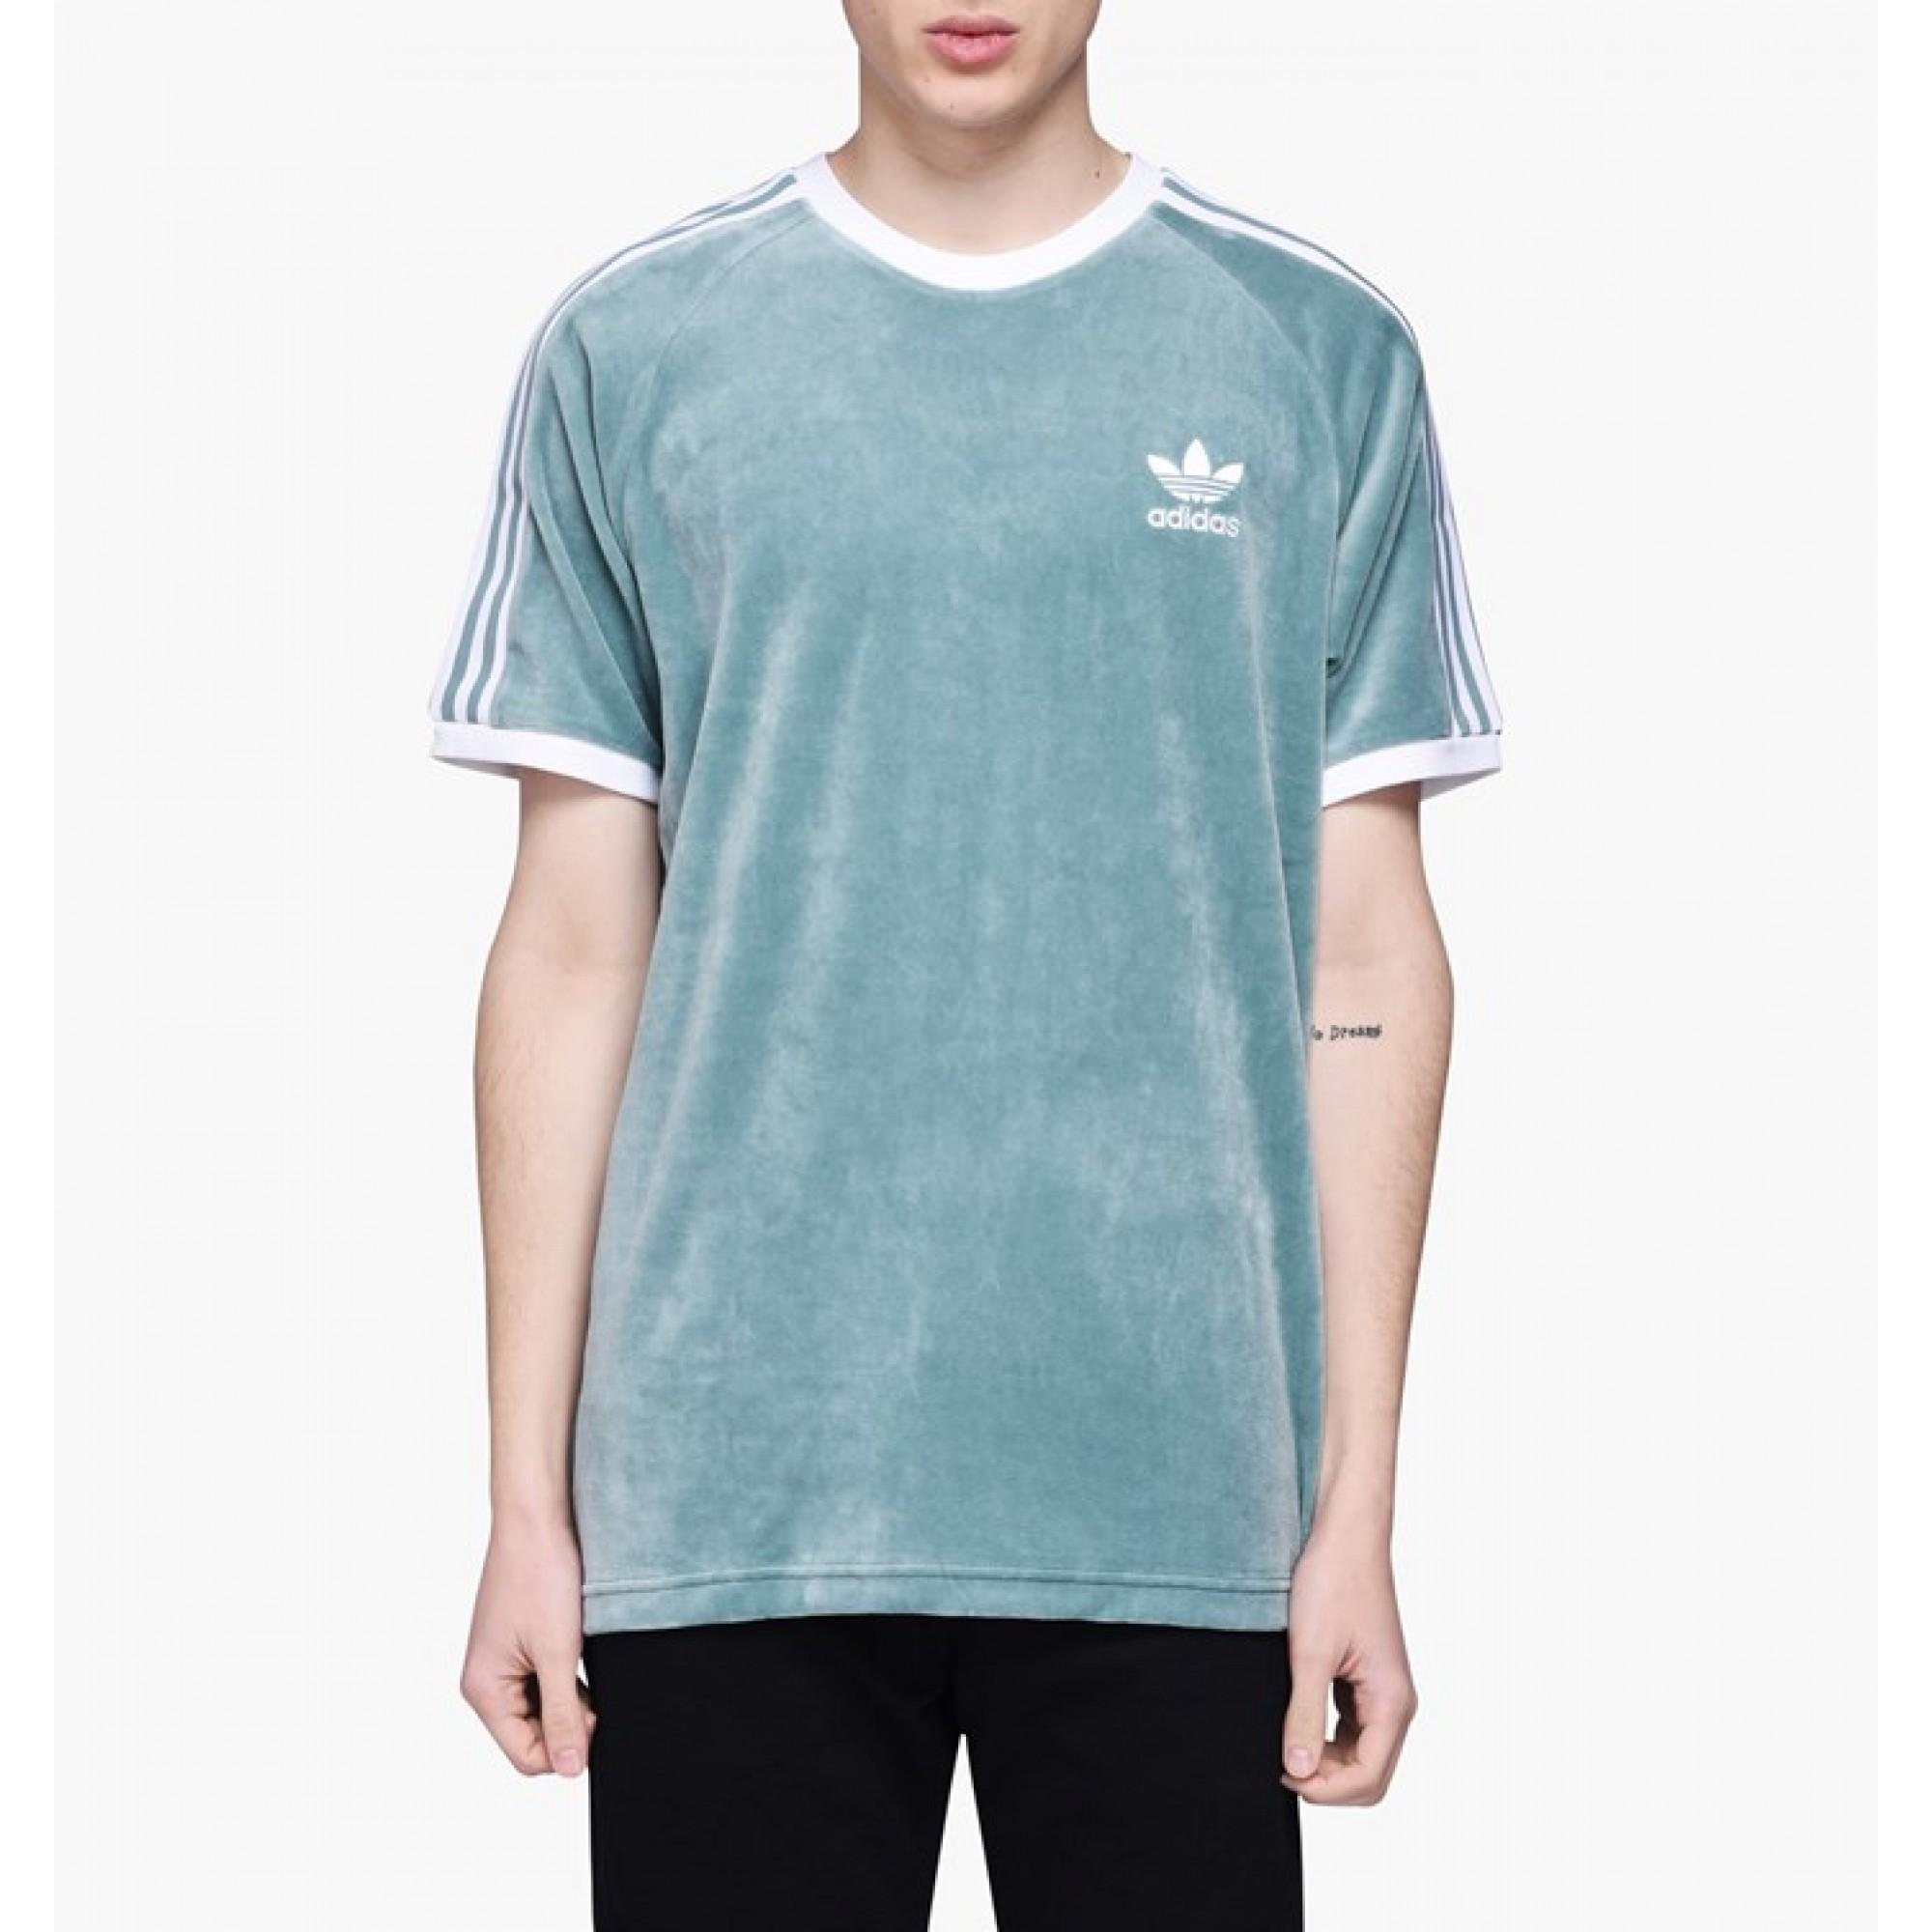 e0b52e2b Men's Adidas Originals Cozy Tee in green |DV1623